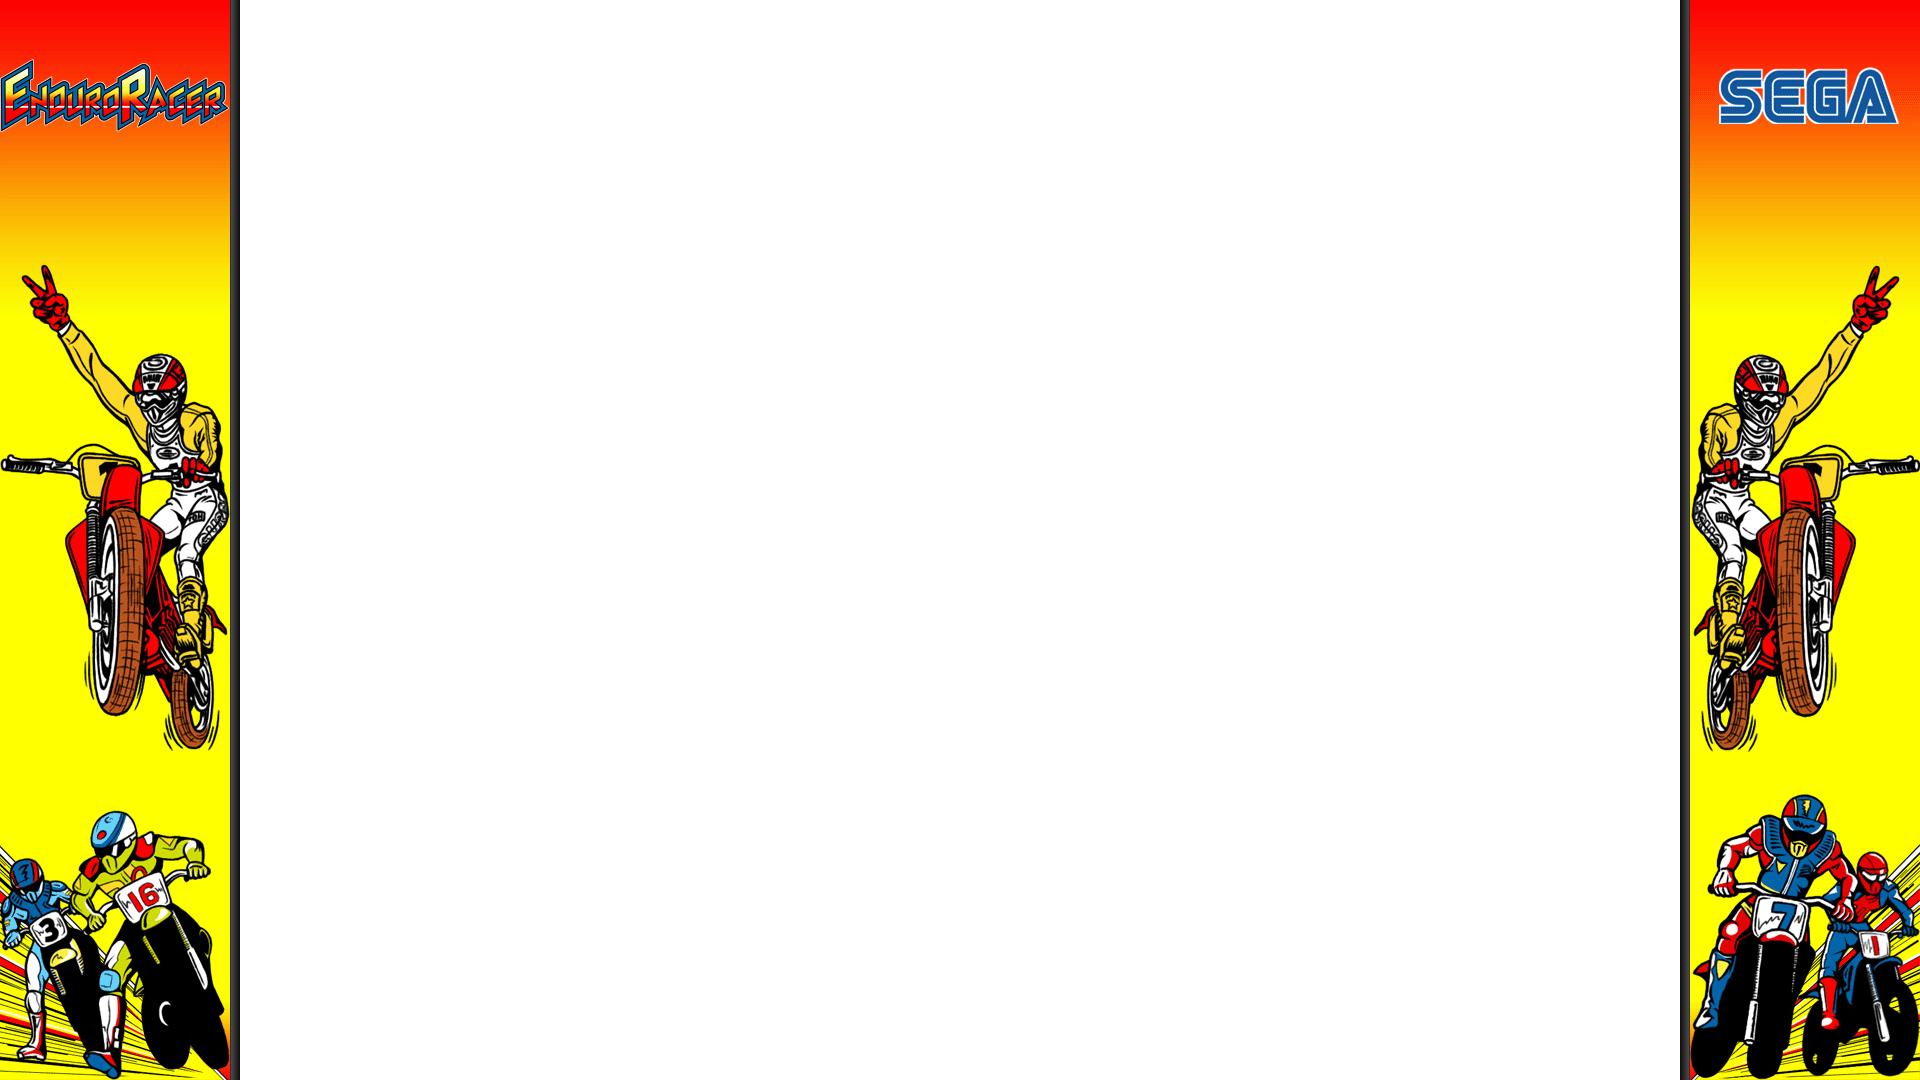 Enduro Racer 1080p overlay